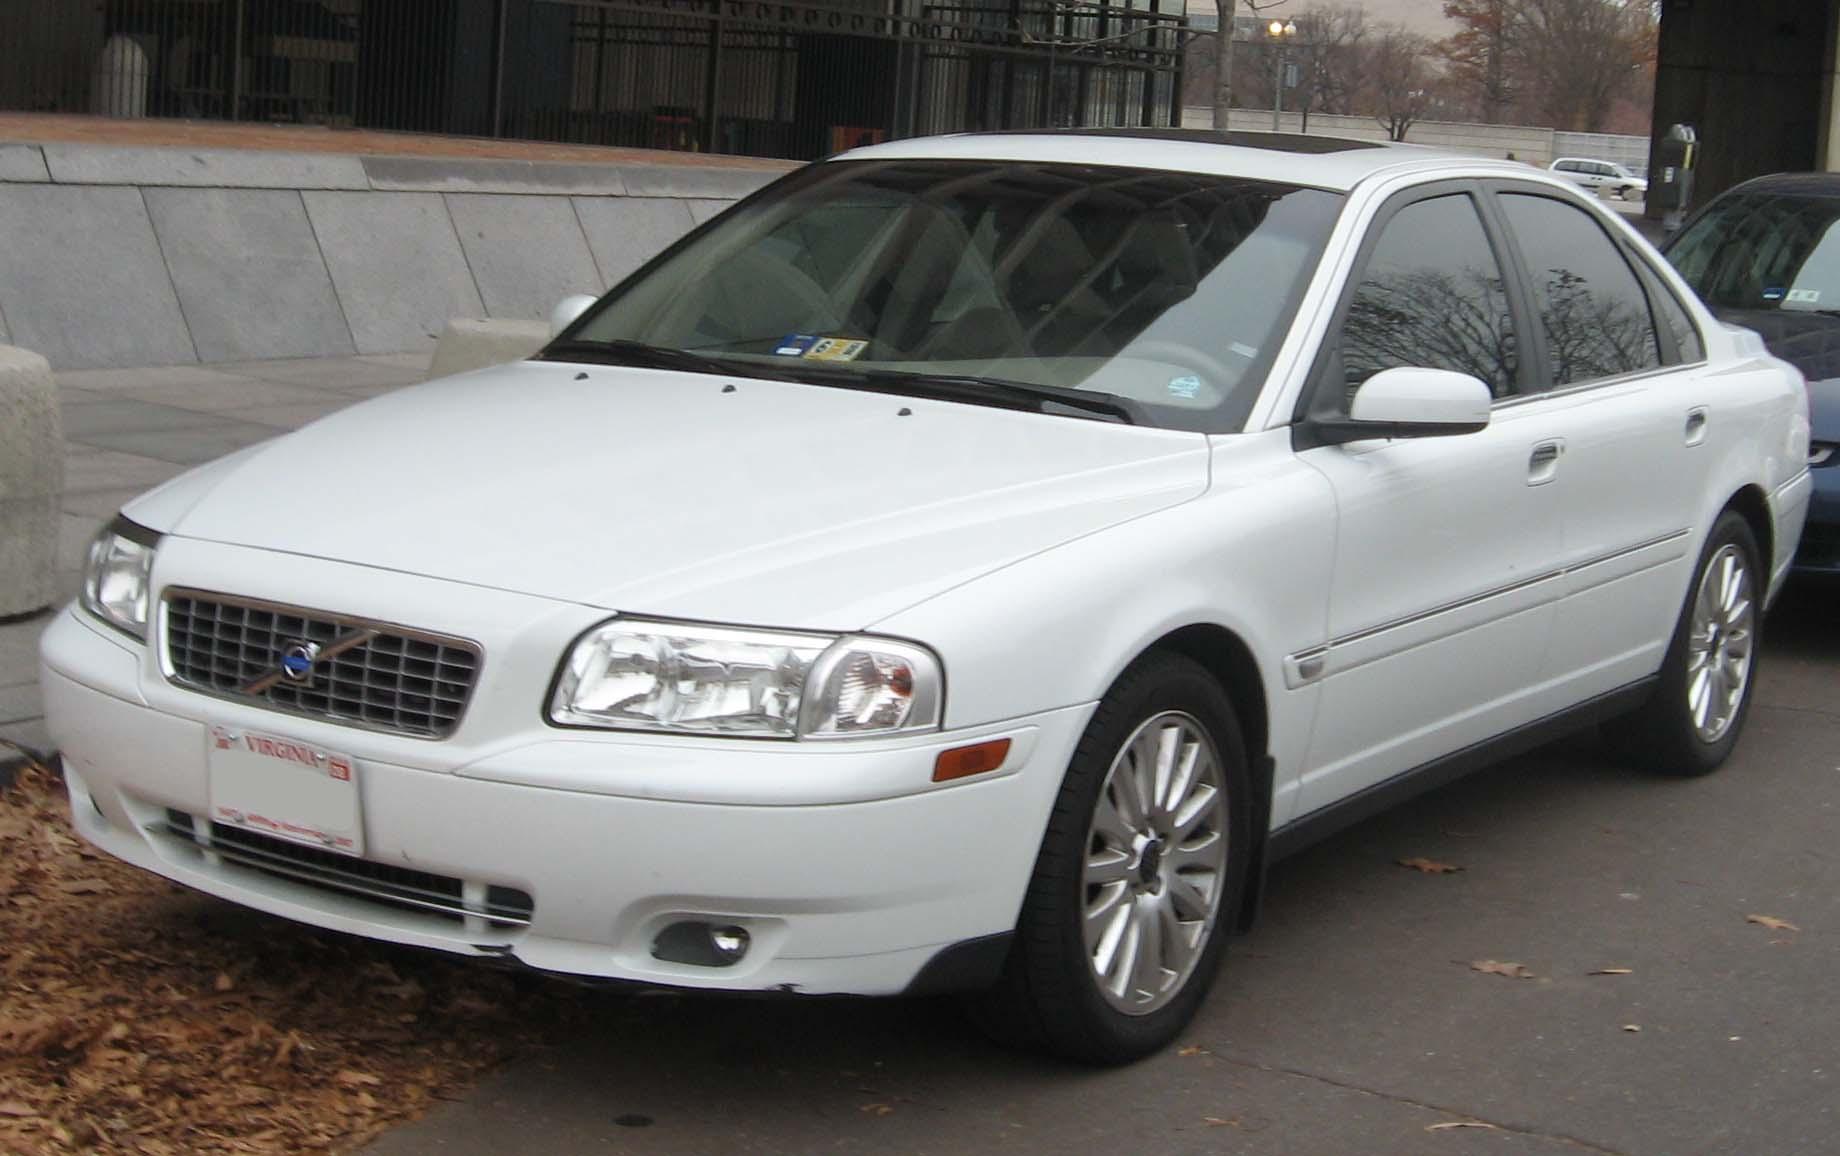 file 2004 2006 volvo s80 jpg wikimedia commons rh commons wikimedia org 2006 Volvo S80 2004 Volvo S80 White